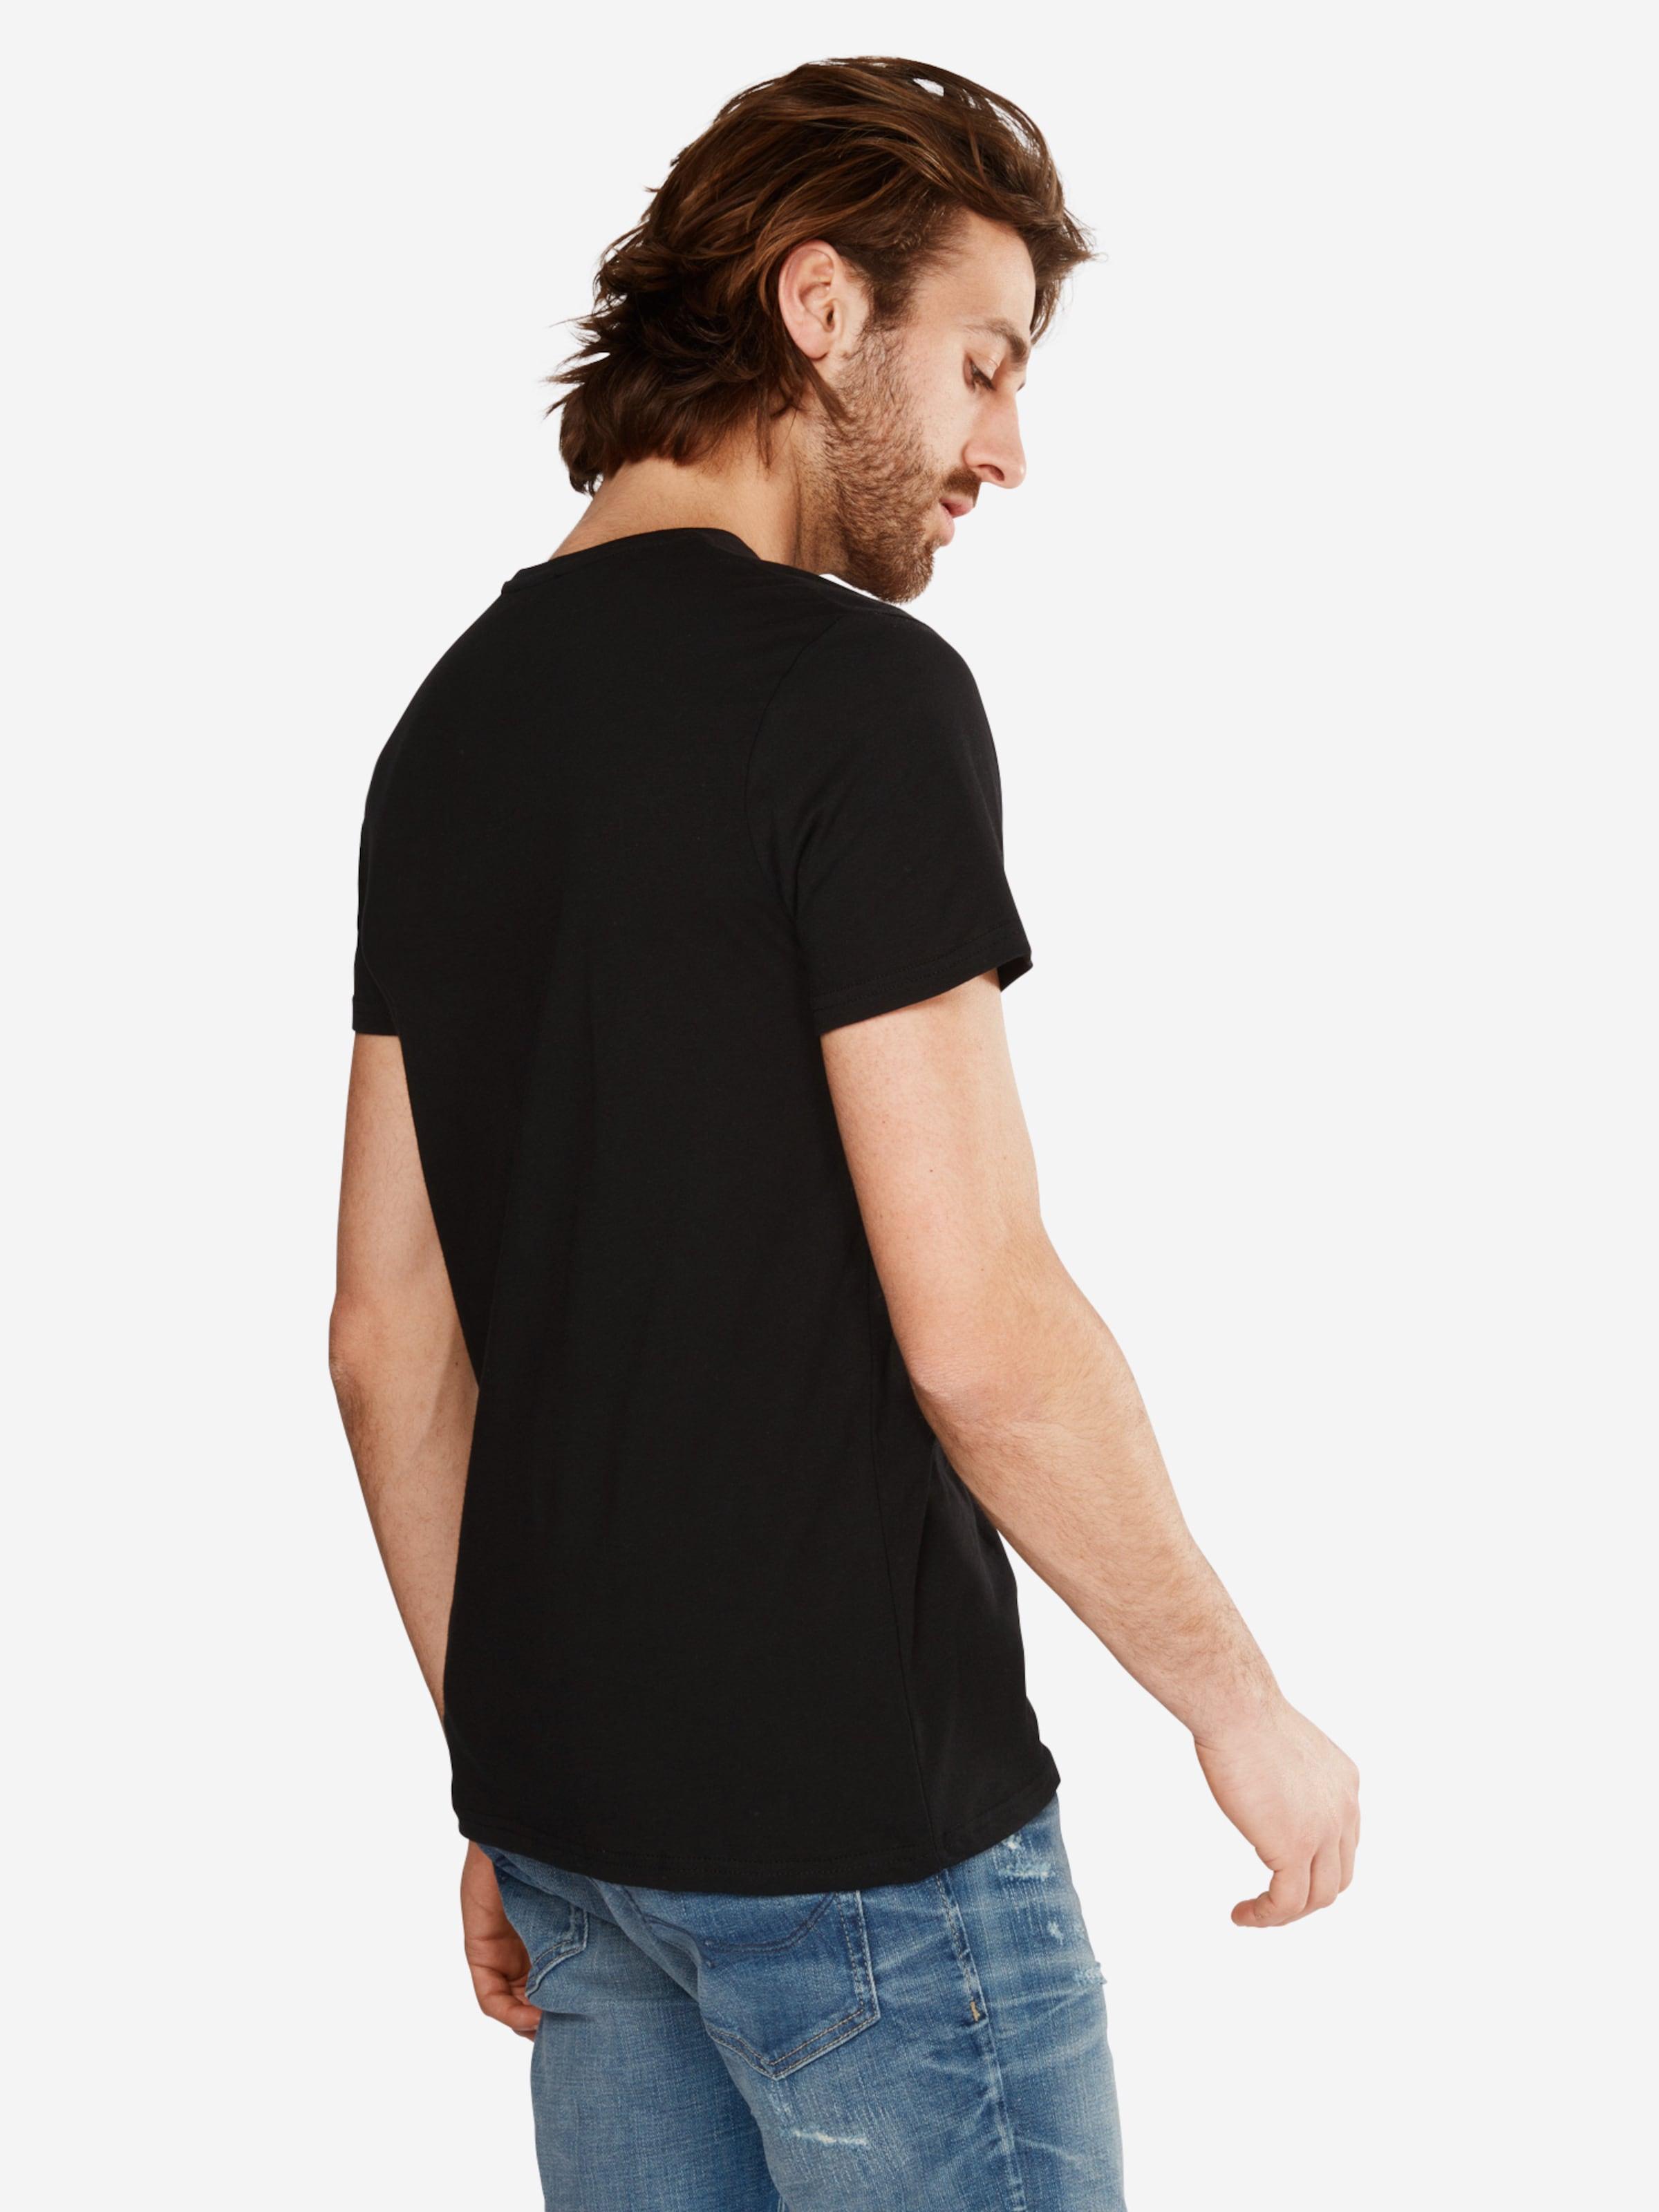 LTB T-Shirt 'DOFANI T/S' Steckdose Neu 100% Authentisch Online ctMgdZVCdS